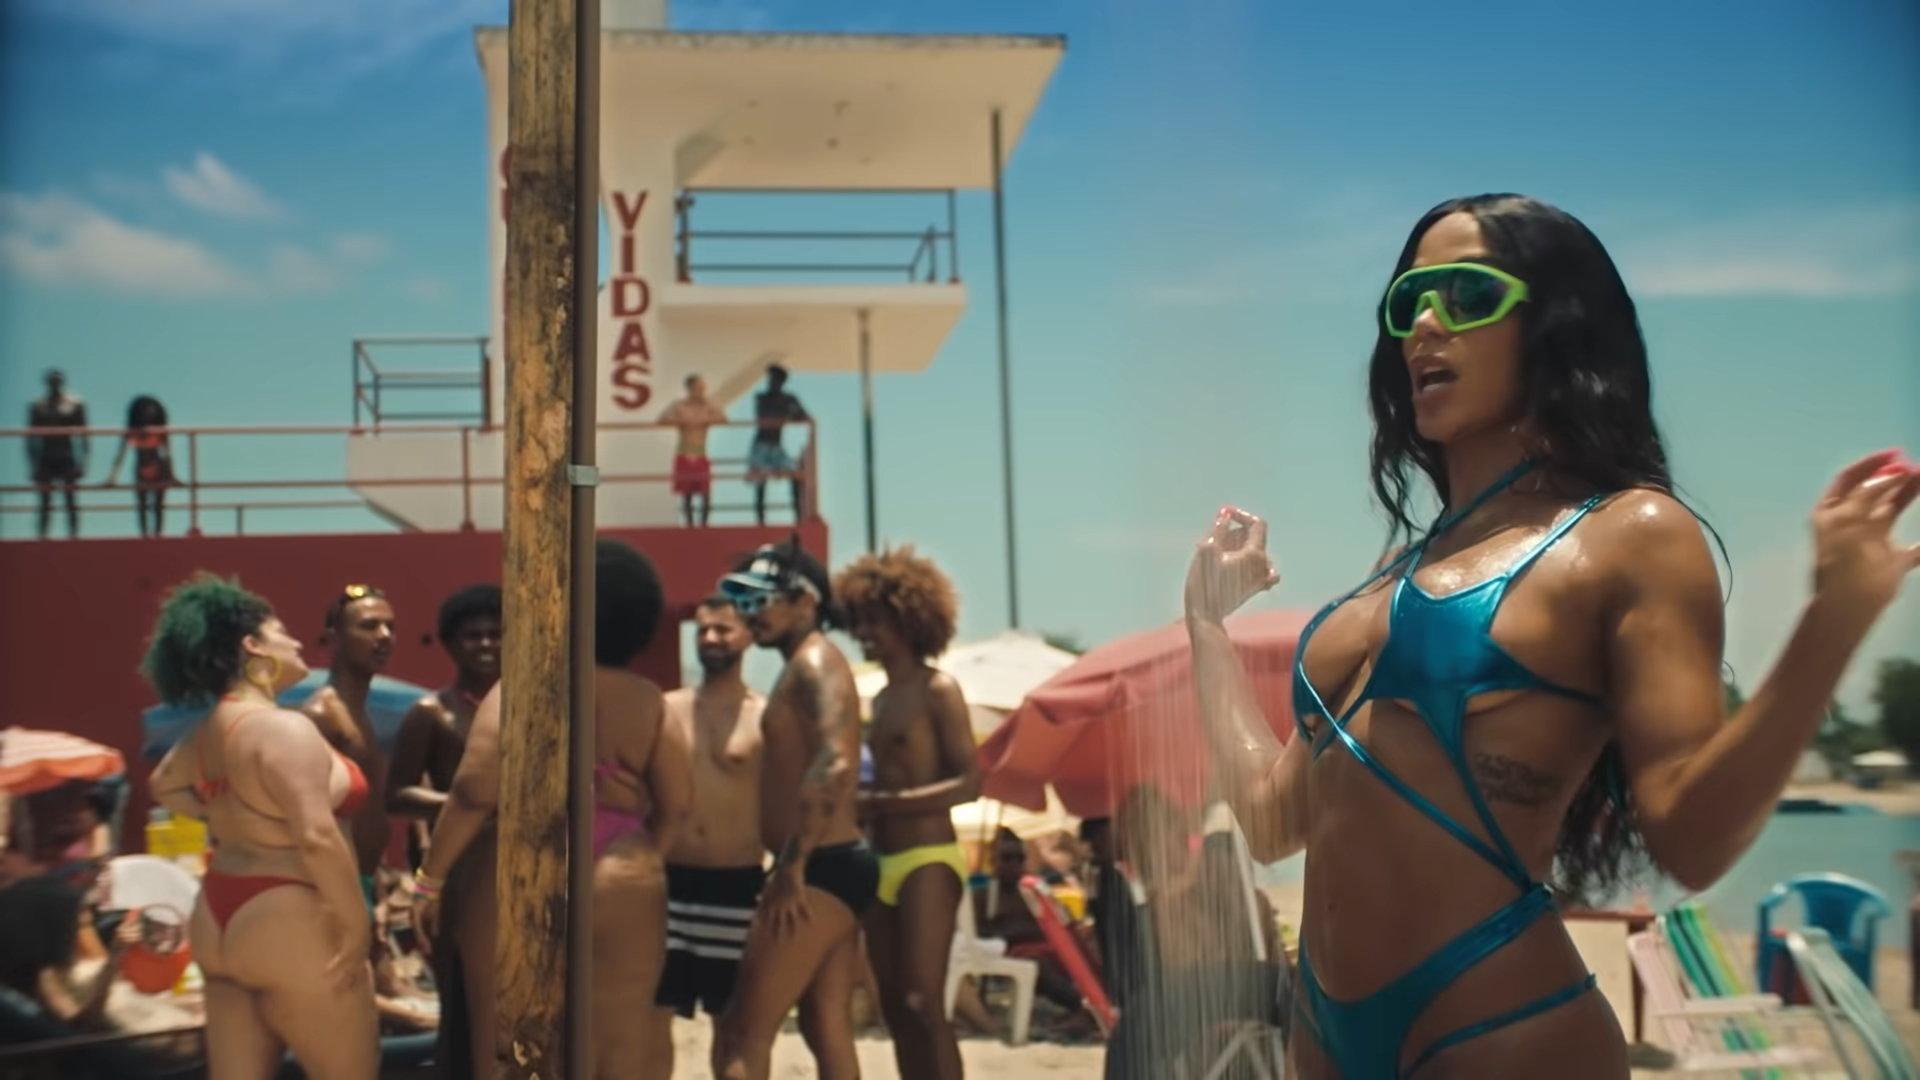 Anitta - Girl From Rio (Official Music Video) 2-15 Screenshot